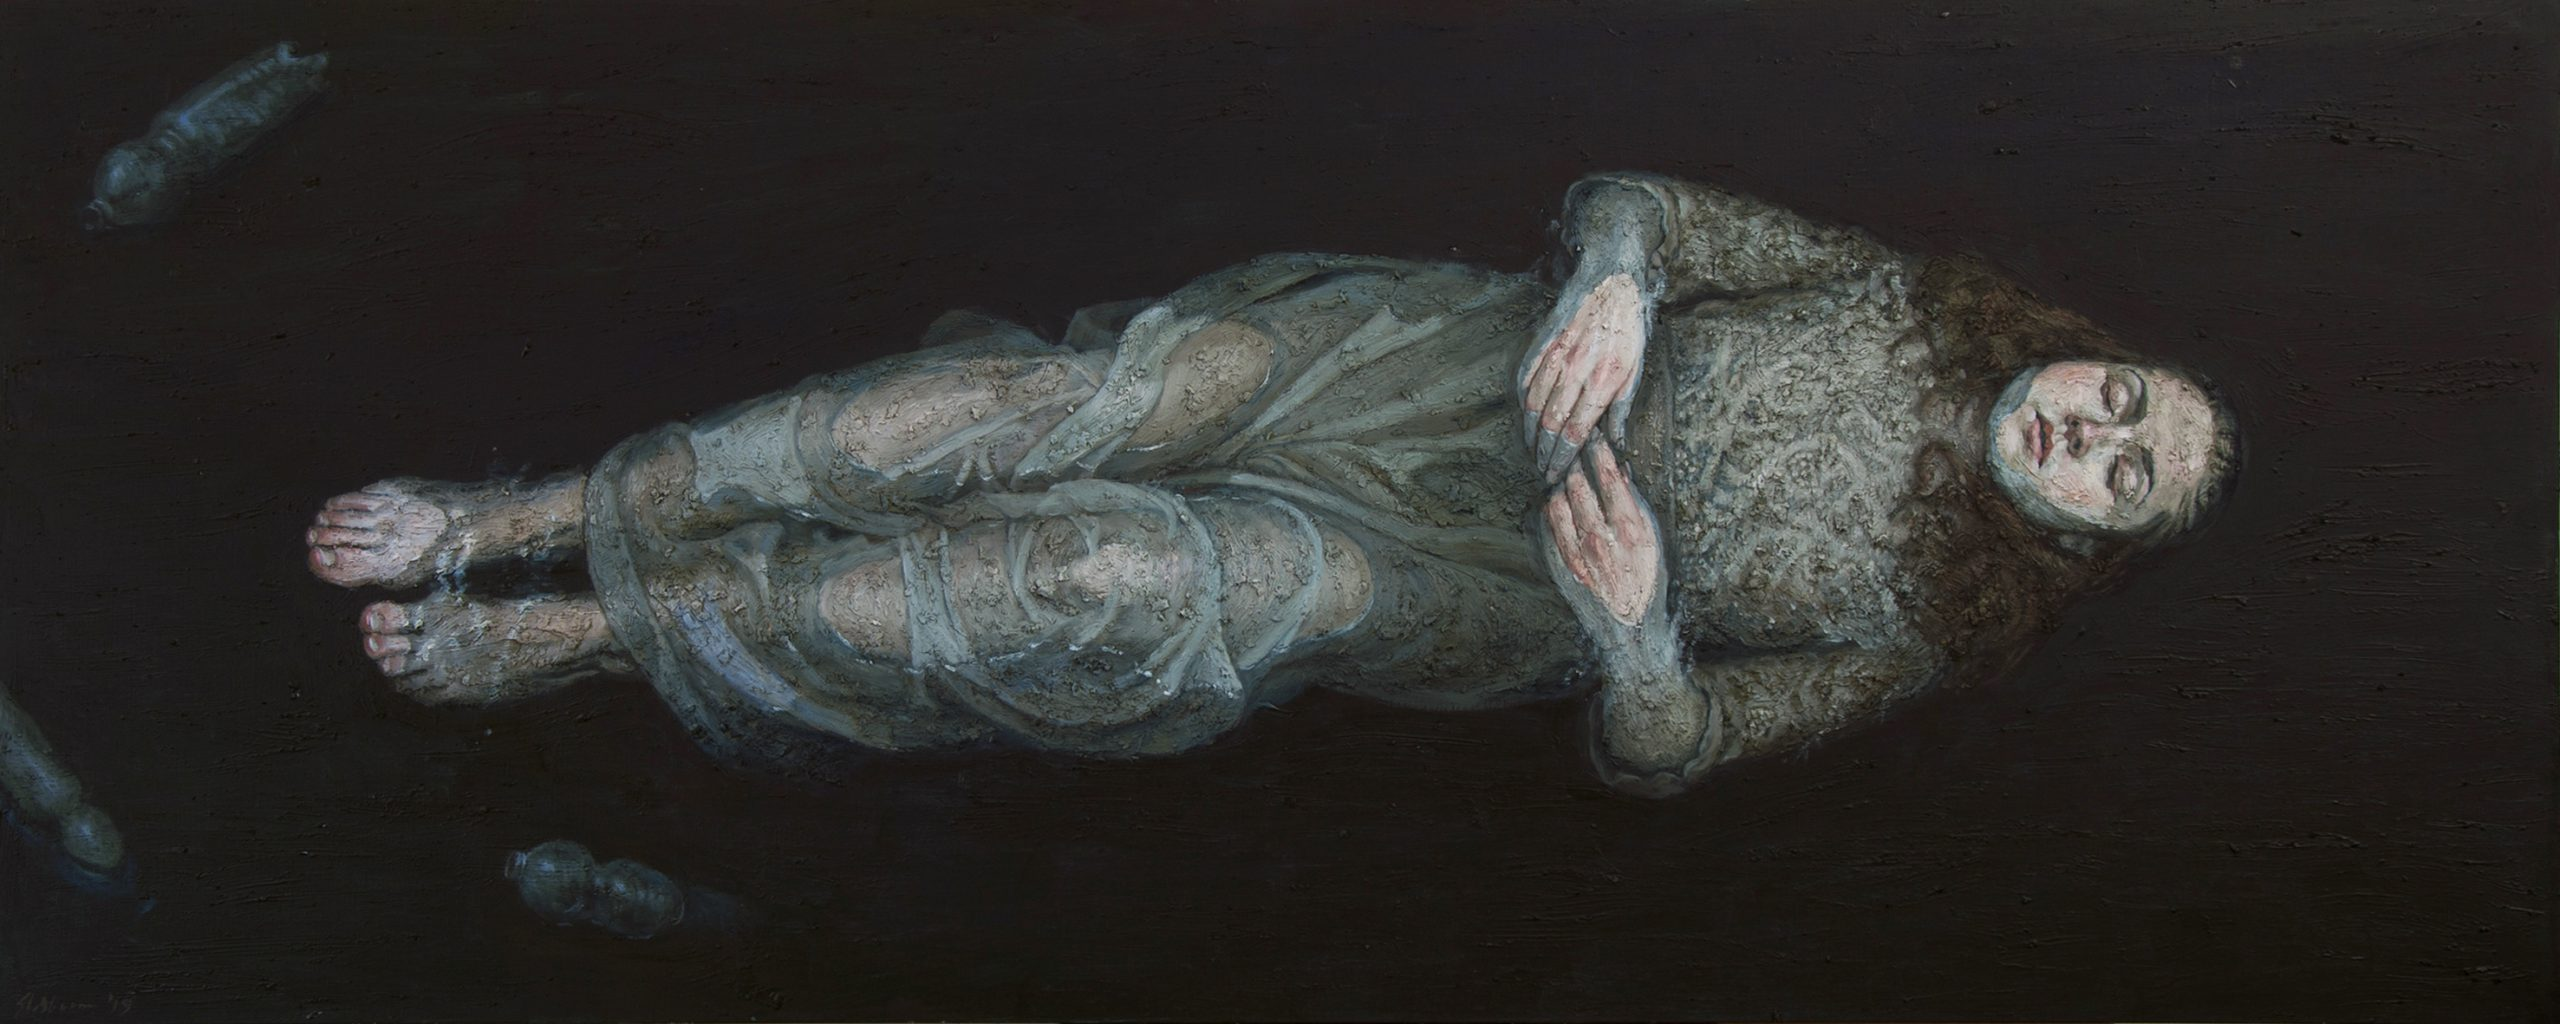 © Museum Martena Gert Jan Slotboom Drowning Season - 250 cm x 100 cm - 2019